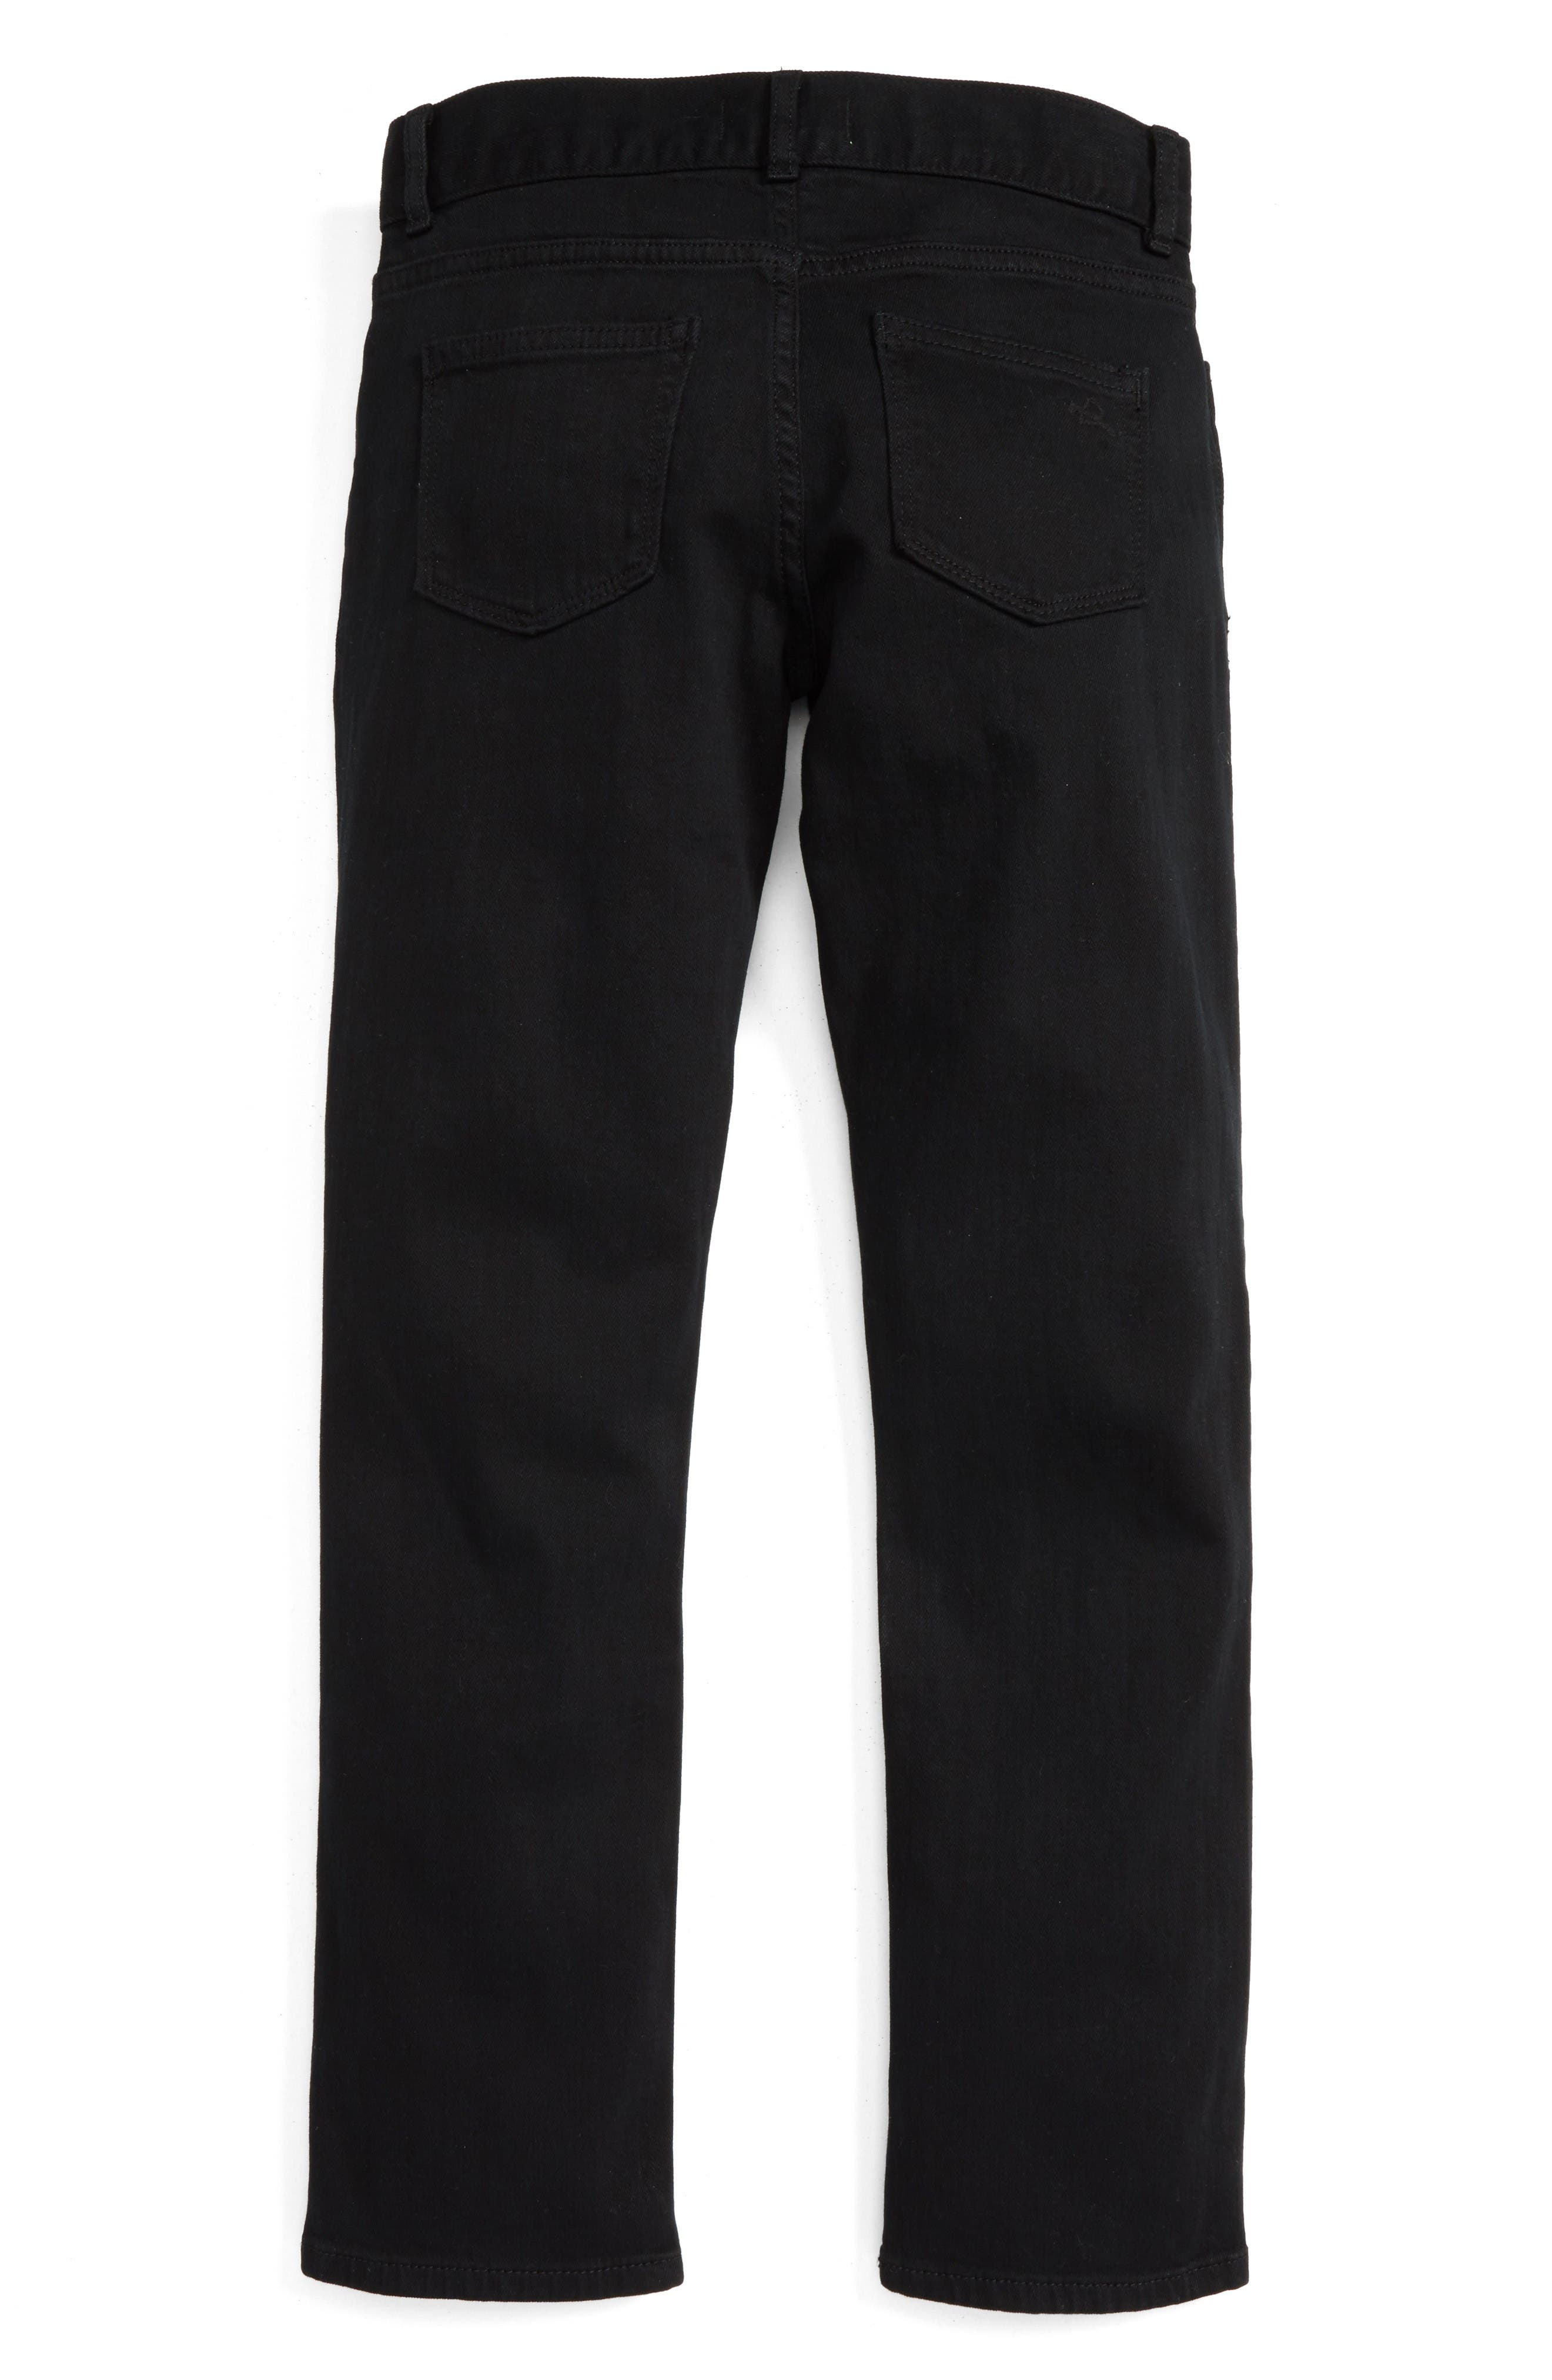 Alternate Image 2  - DL1961 Brady Slim Fit Jeans (Big Boys)